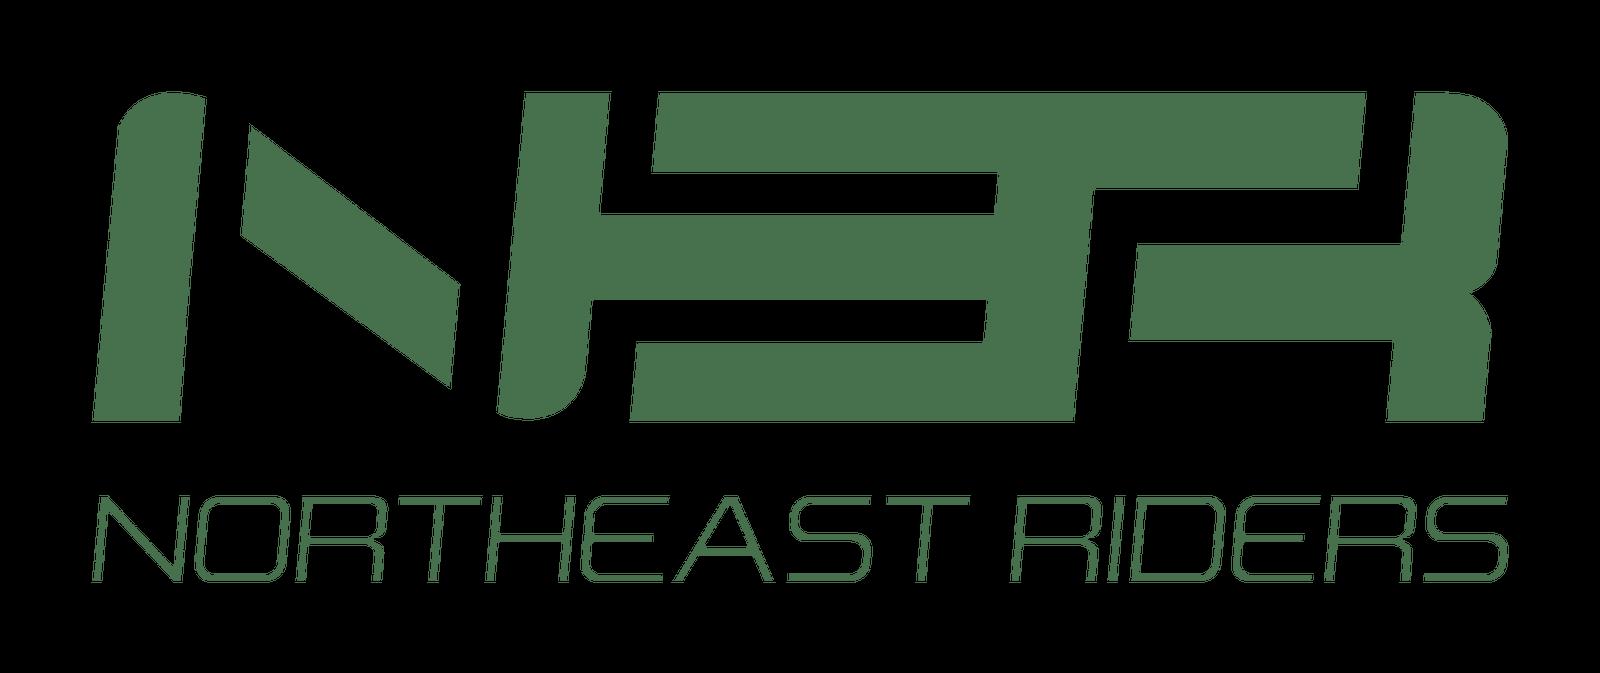 northeast-riders-block-black-300dpi.png